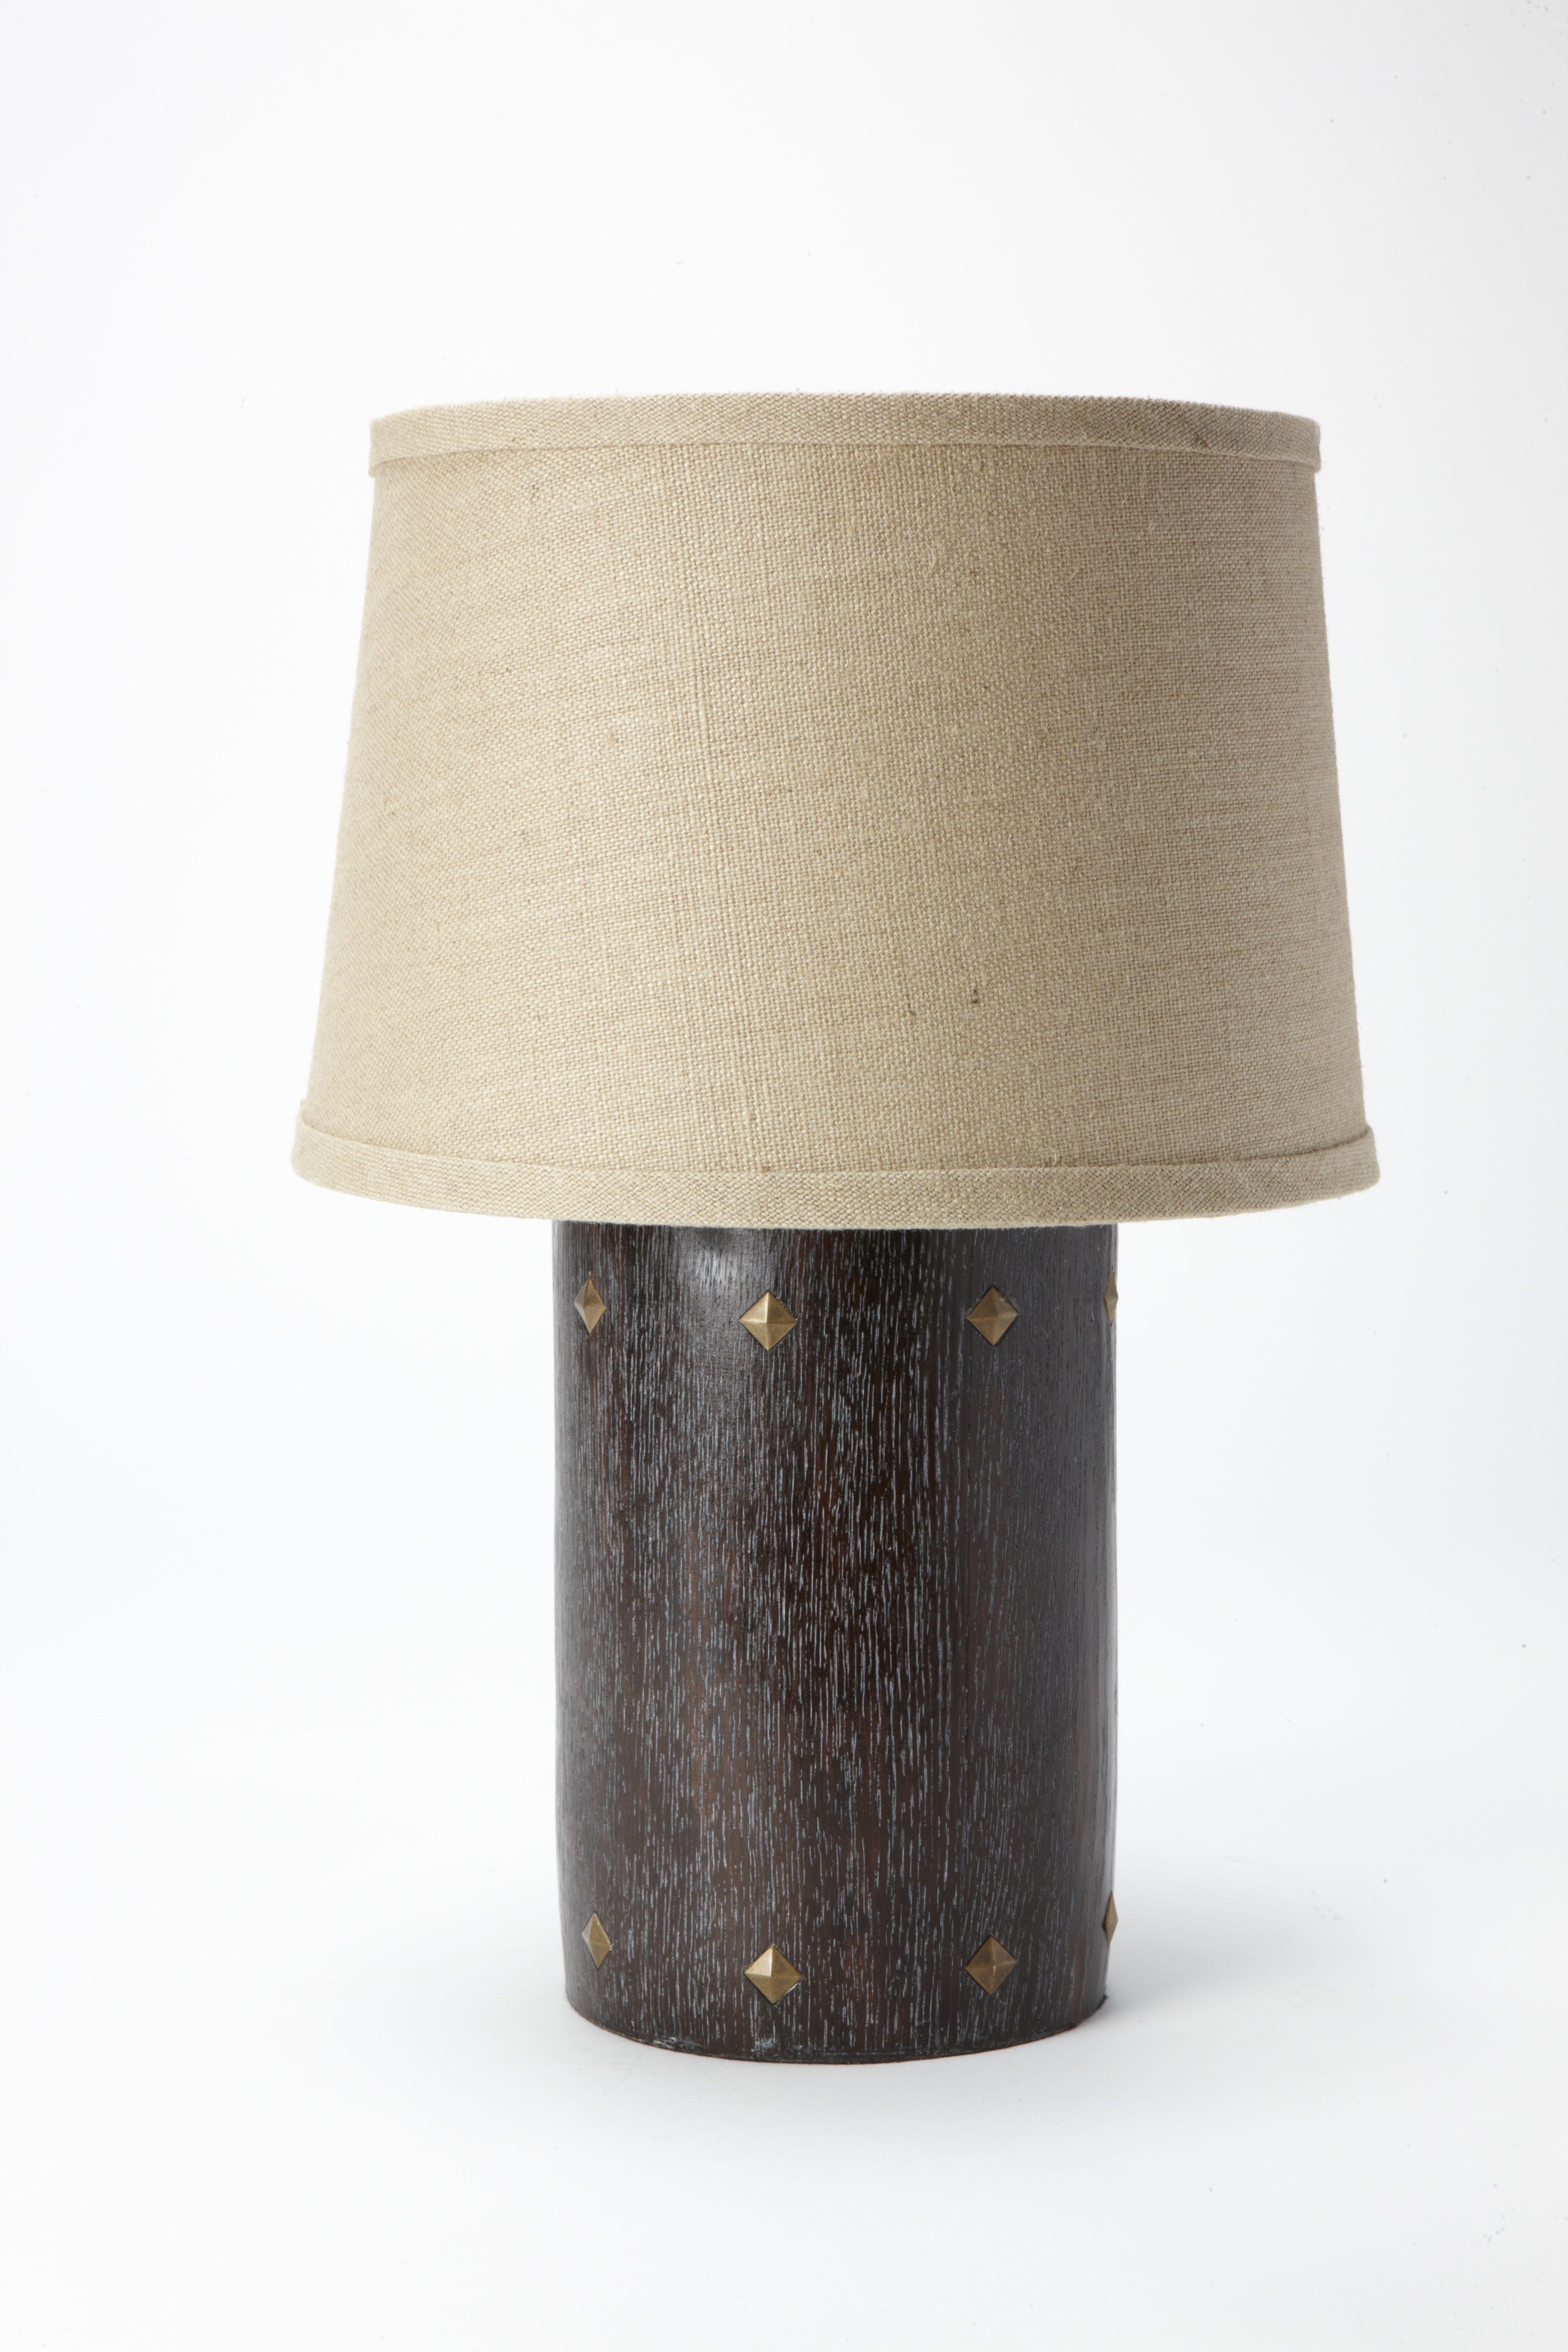 Nathan Santos Berkus Studded Table Lamp With Natural Shade Linen